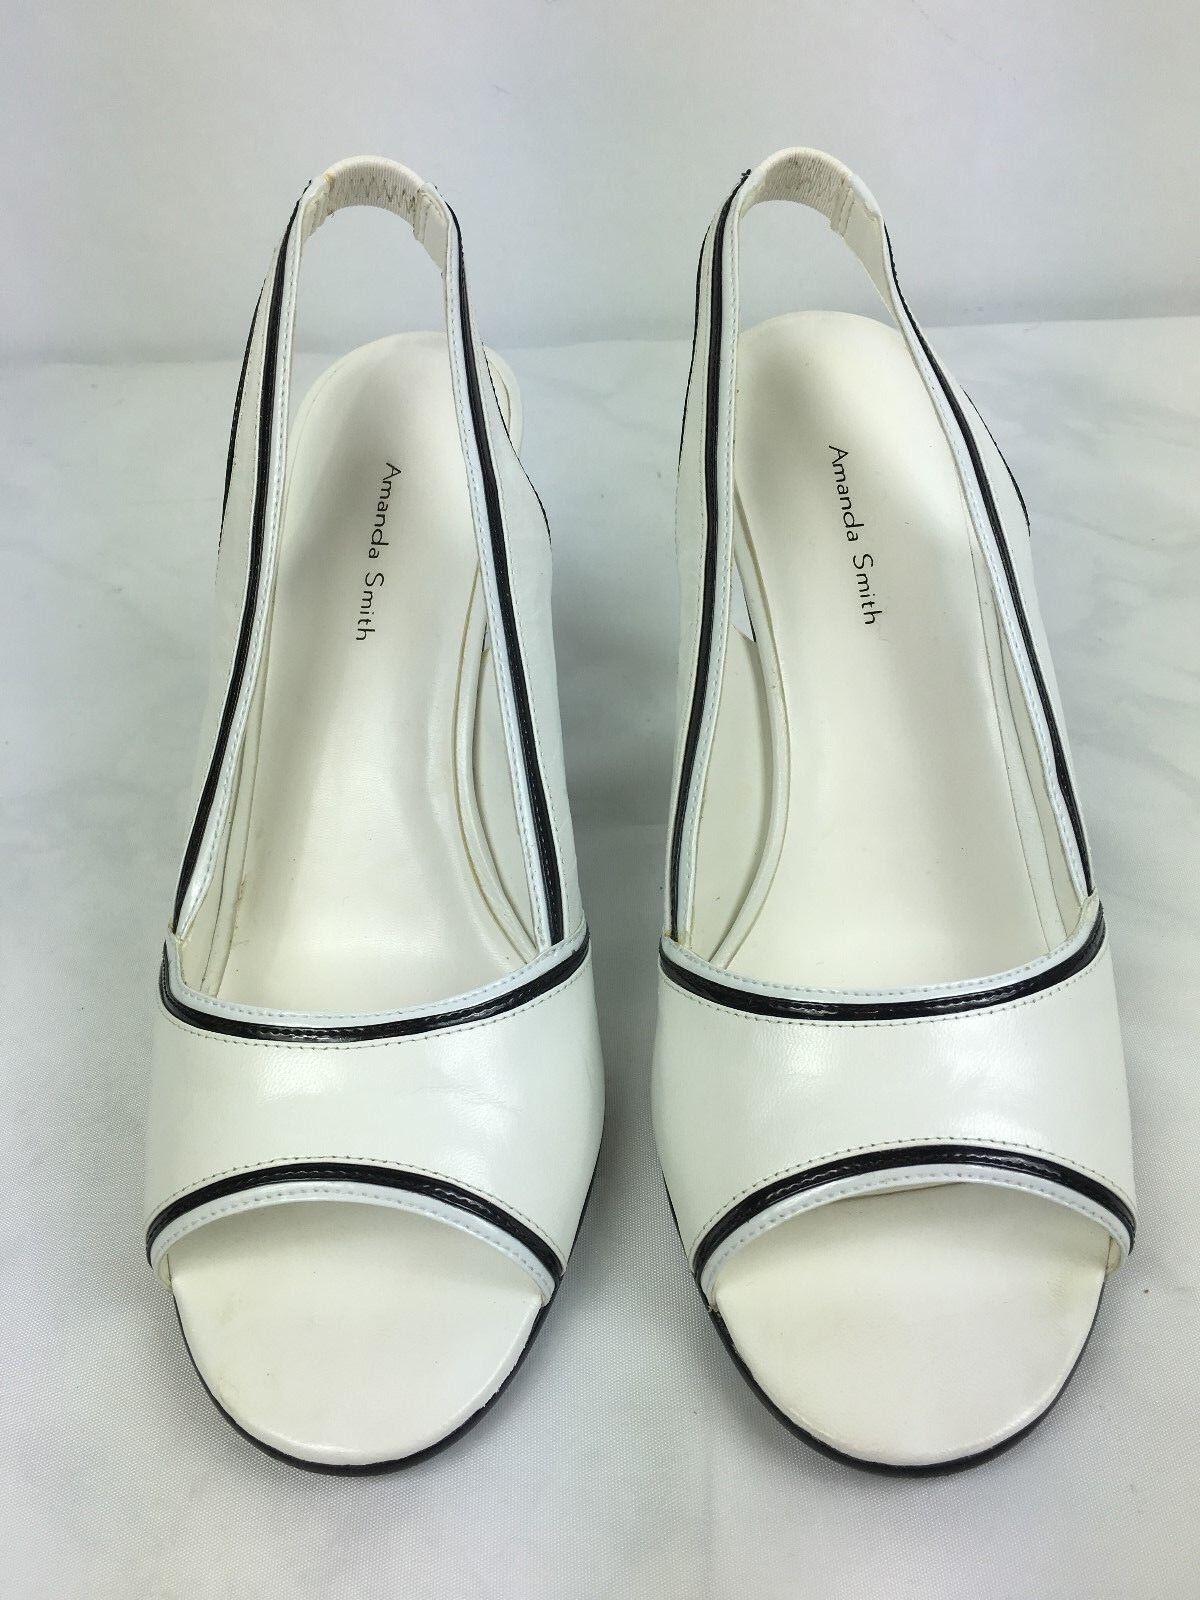 Amanda Smith Leather Ankle 8.5M Strap Shoes Greta Women's Size 8.5M Ankle White 3a2f46